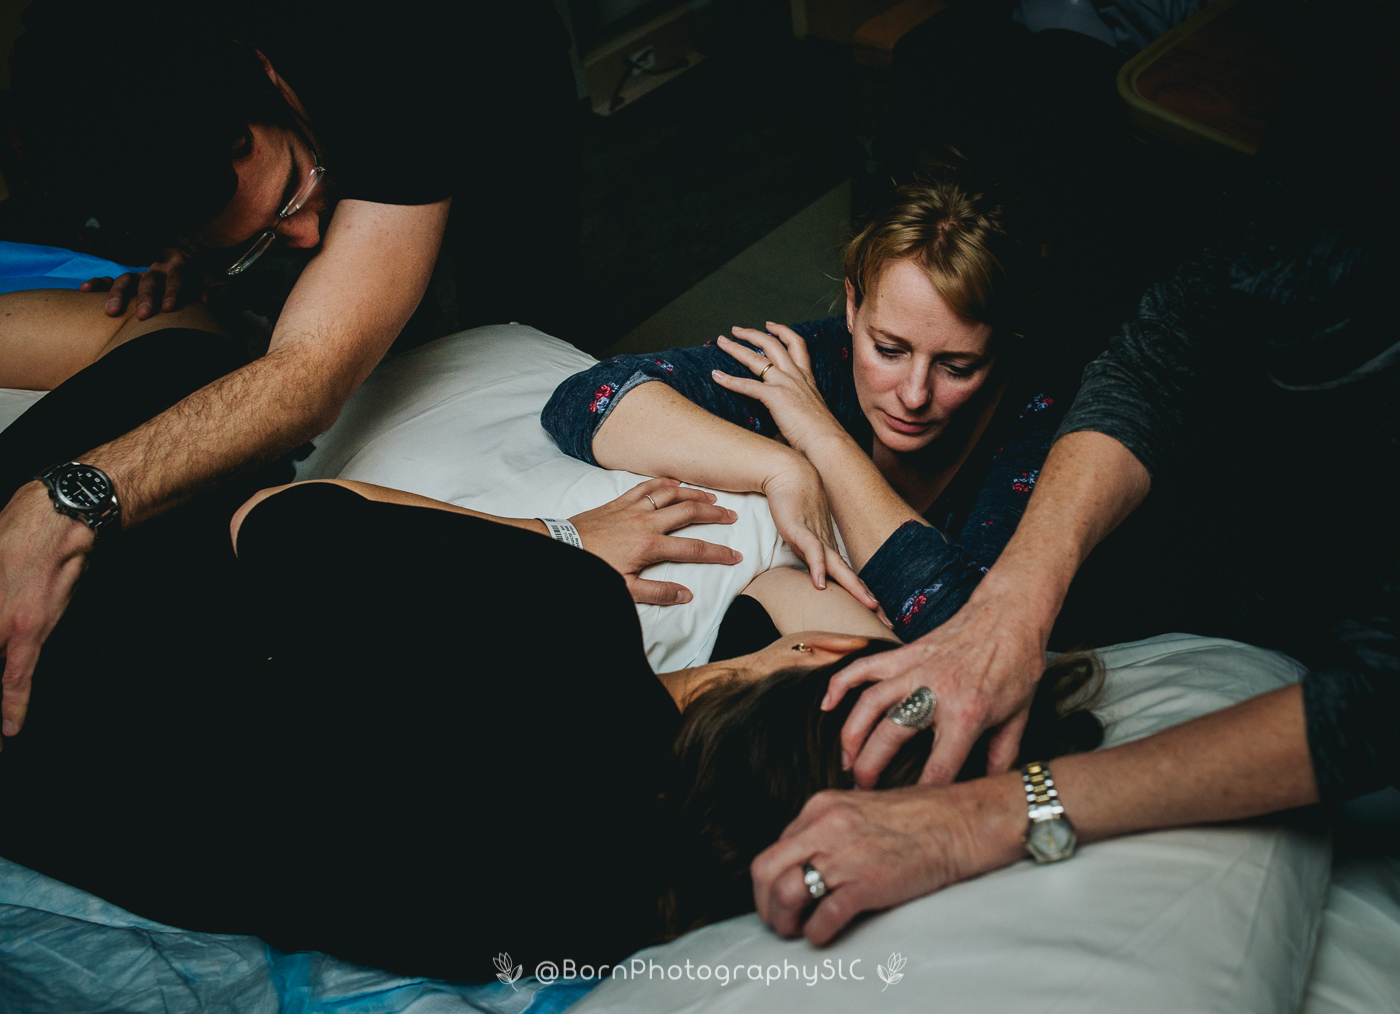 Born-Birth-Photography-University-of-Utah-Salt-Lake-City-Hospital-Birth-32.jpg